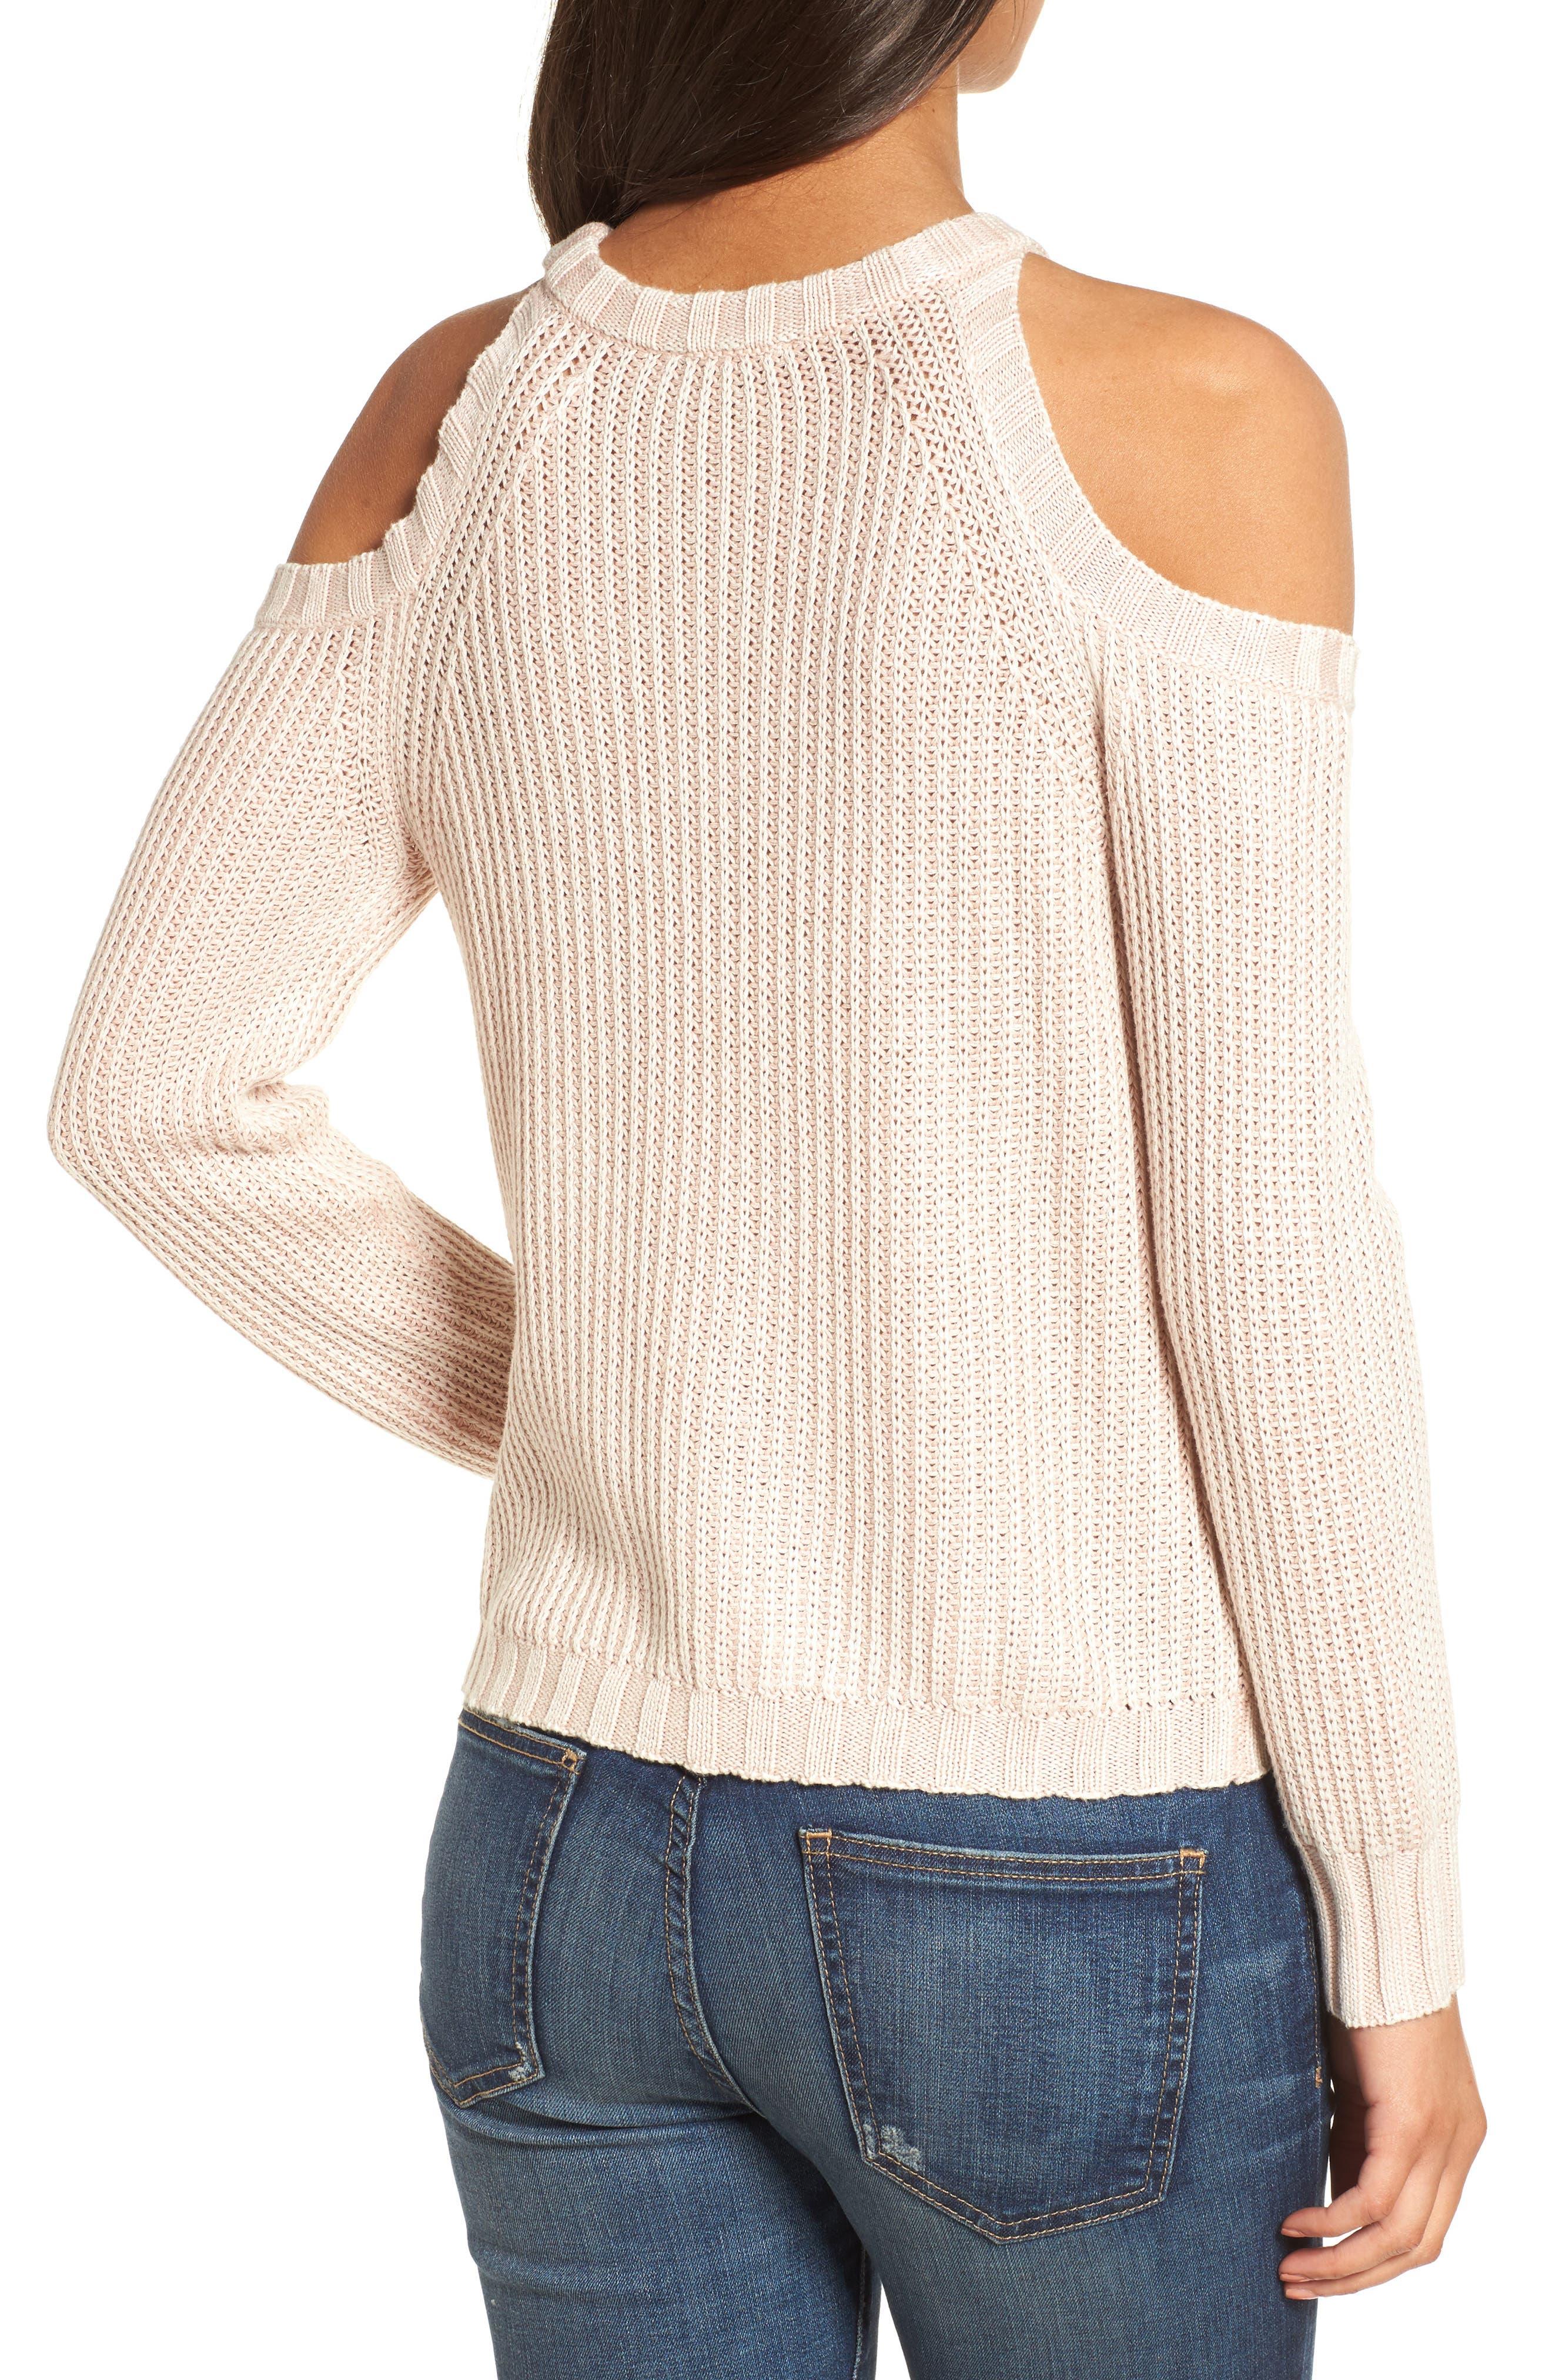 Mika Cold Shoulder Sweater,                             Alternate thumbnail 2, color,                             Blush